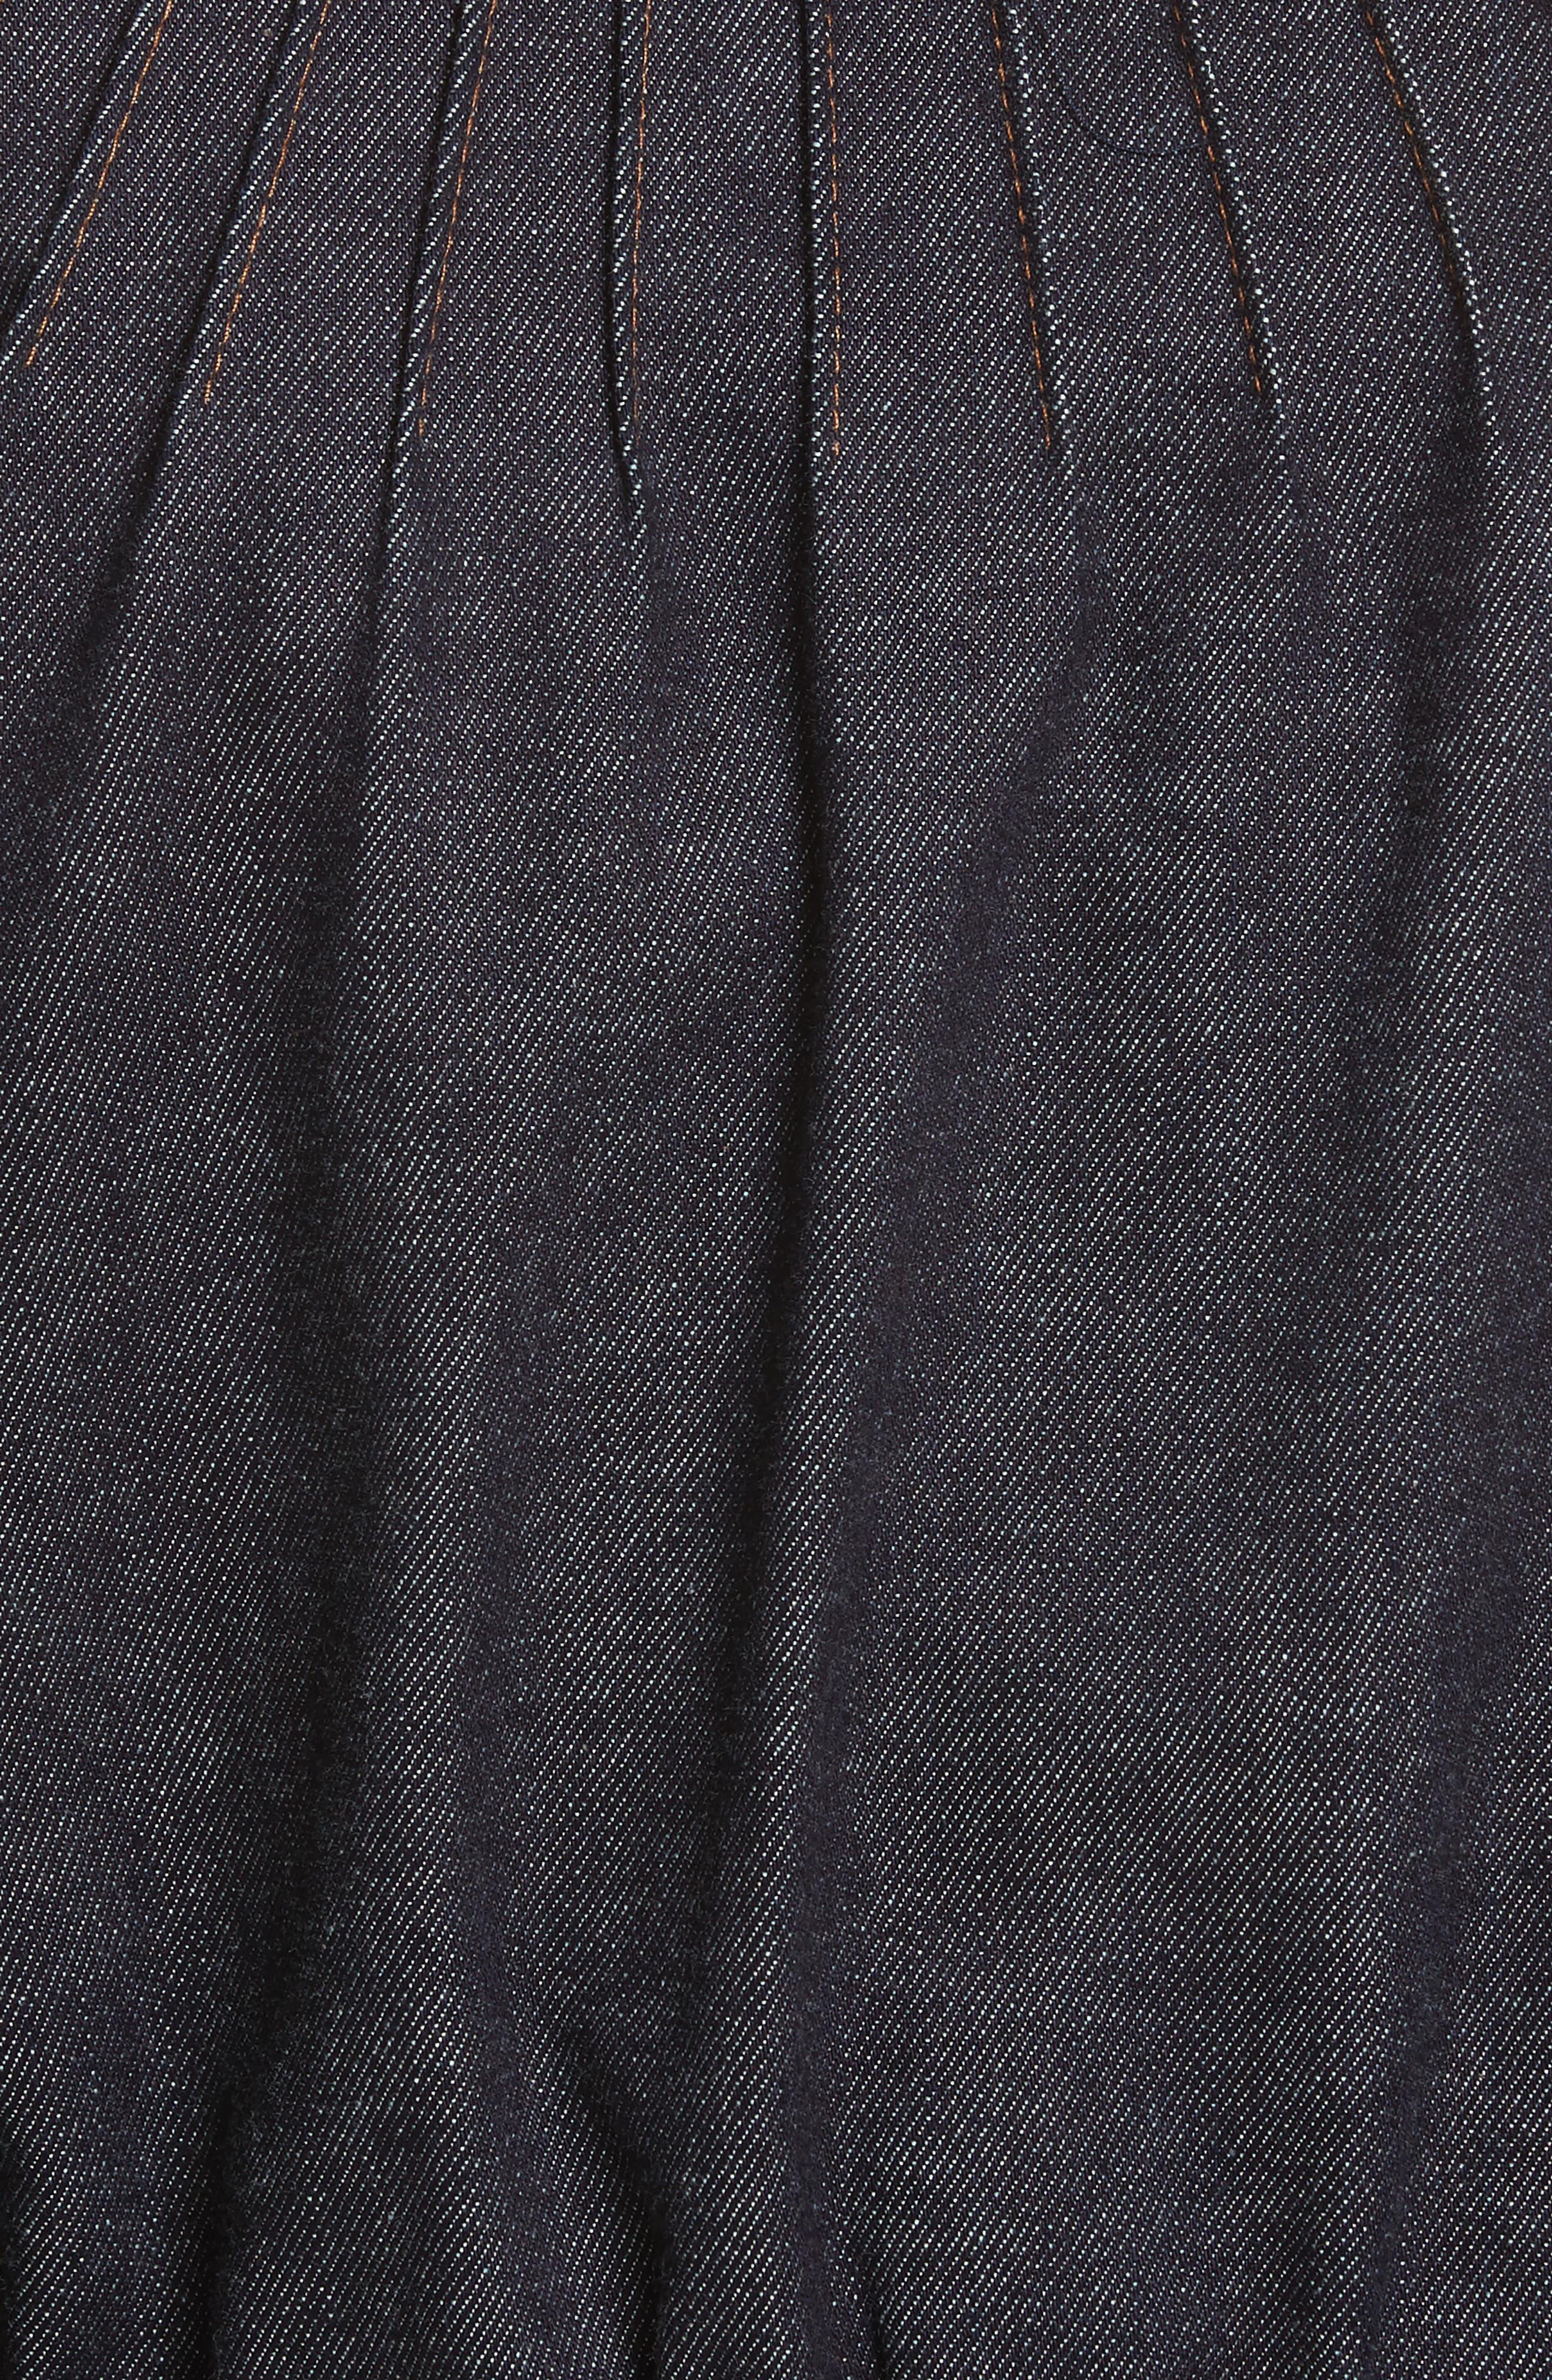 Diane von Furstenberg Pintuck Denim Jacket,                             Alternate thumbnail 6, color,                             Indigo